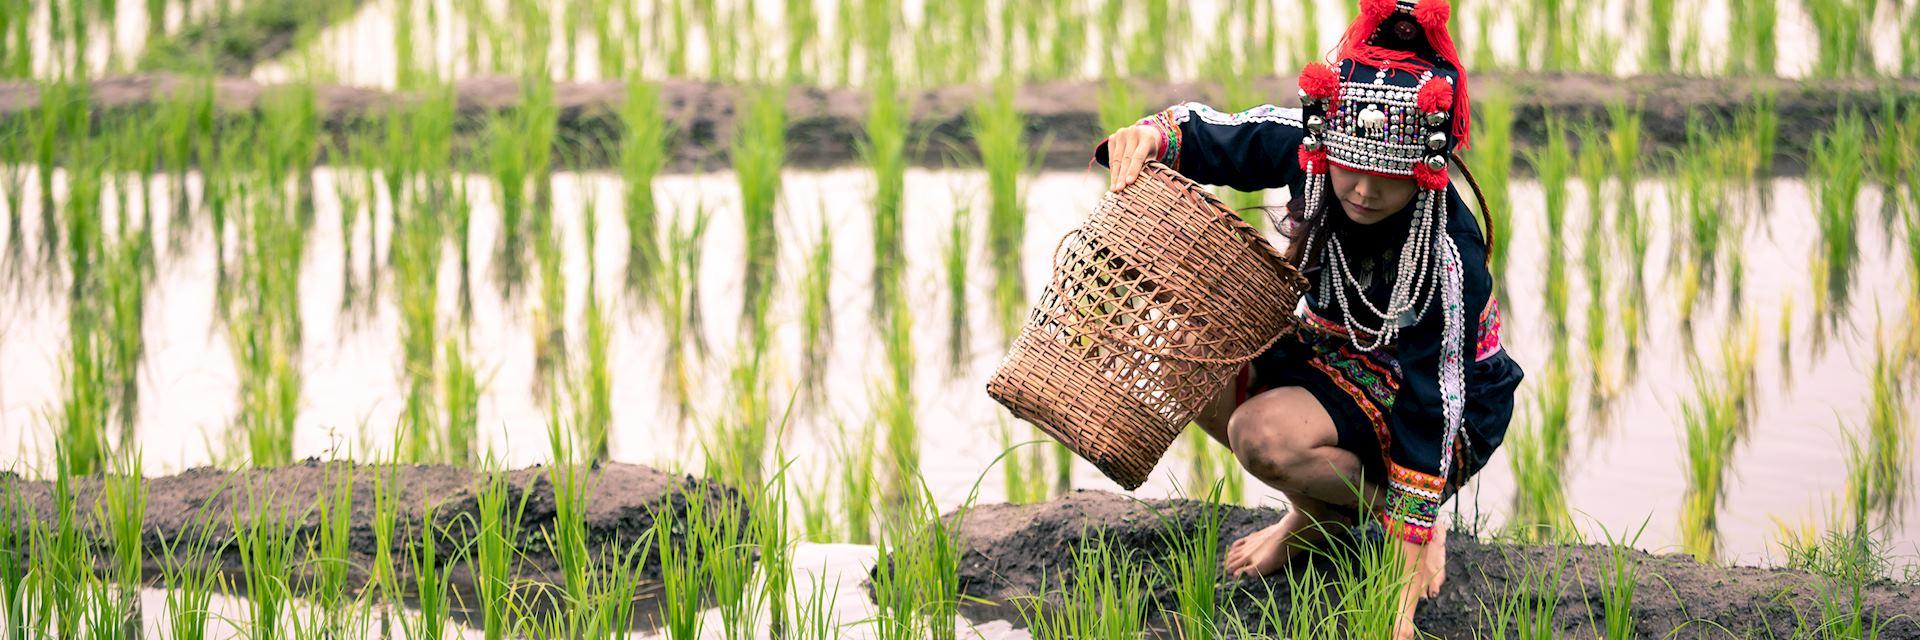 Hmong Woman planting rice